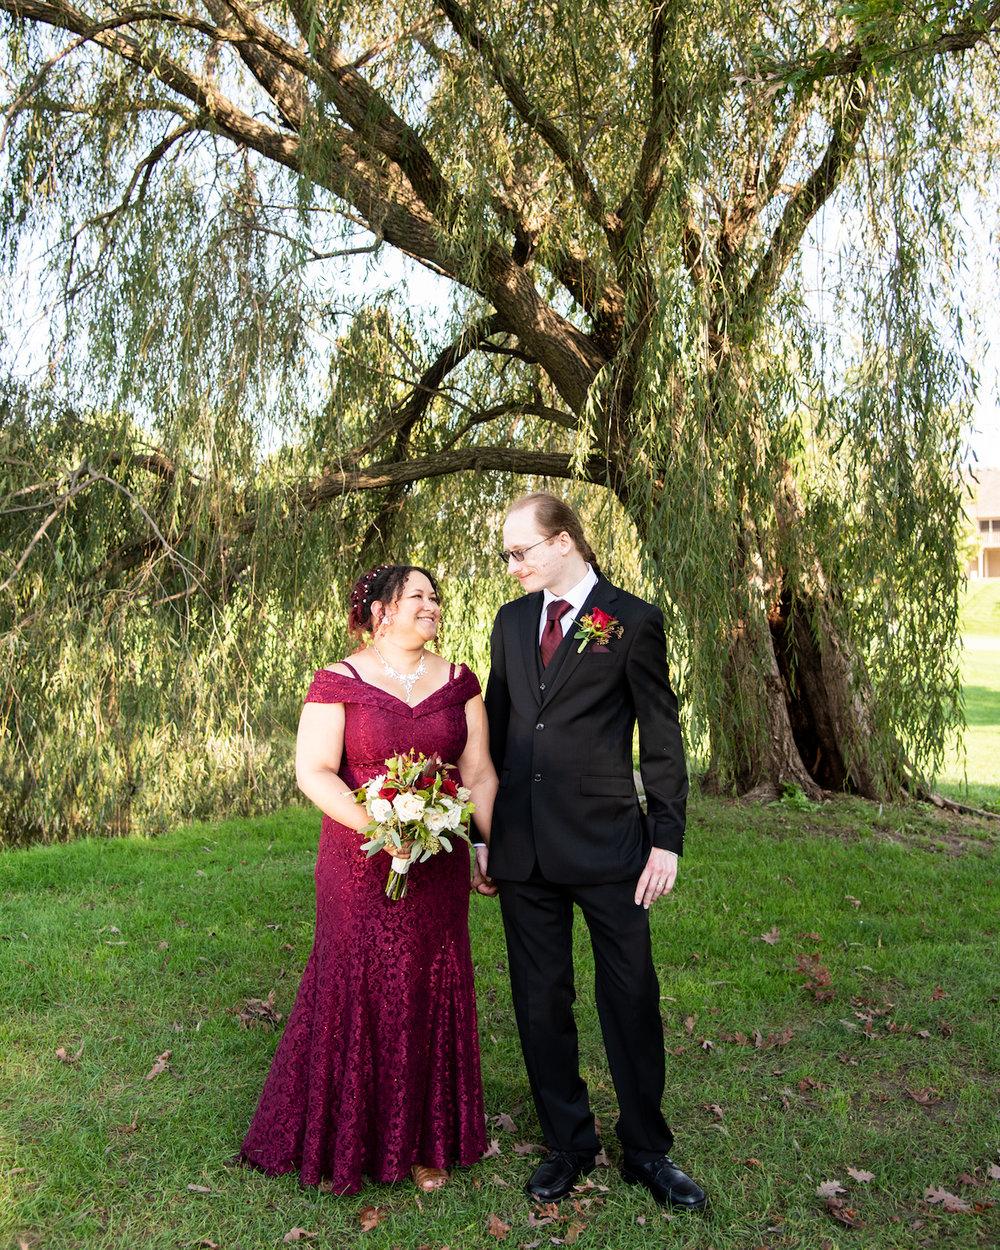 wedding (55 of 72) copy.jpg